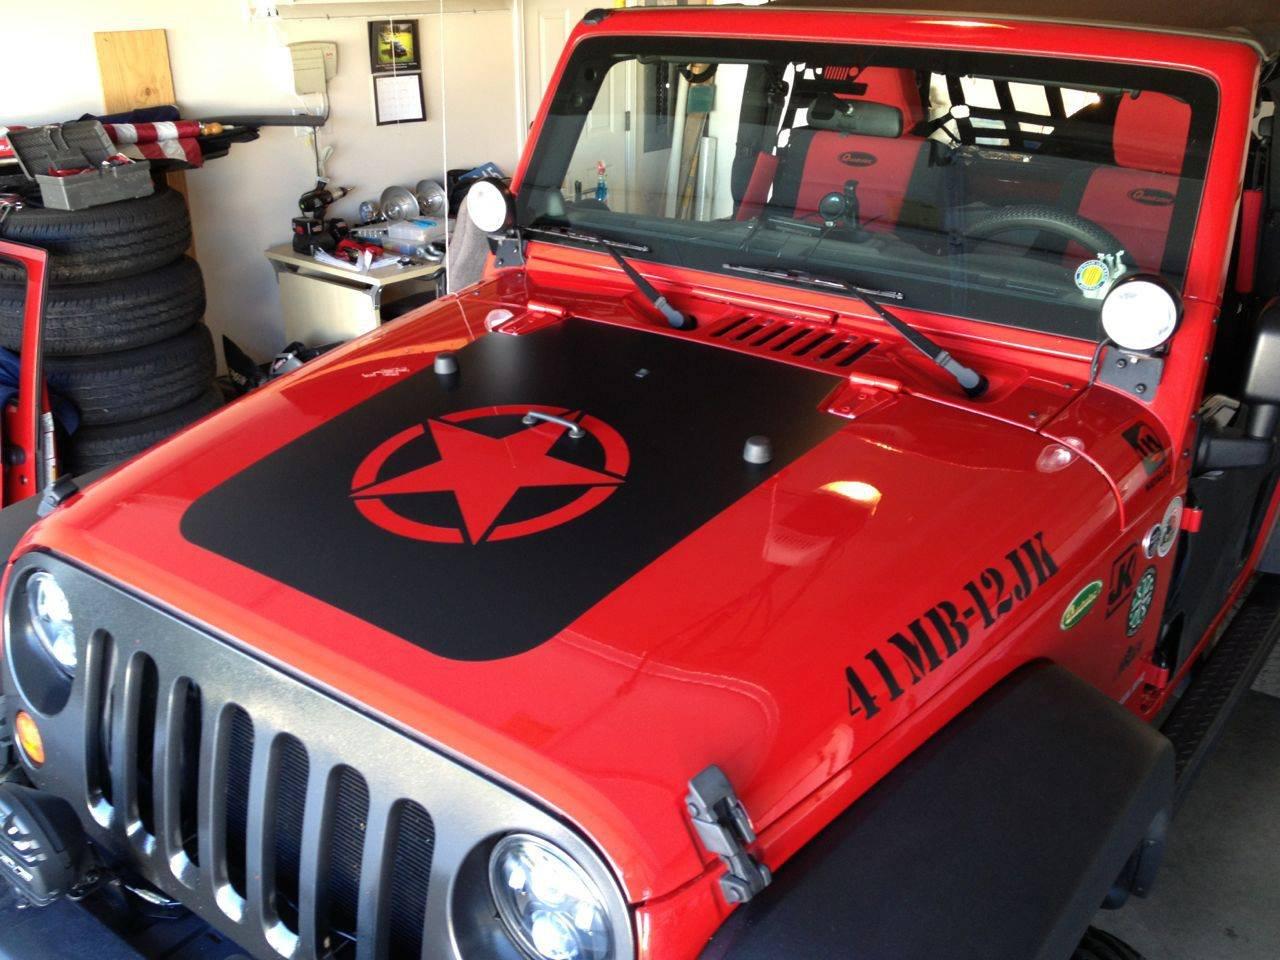 Amazoncom Jeep Wrangler Jk Hood Blackout Matte Black STAR Hood - Jeep hood decalsmatte black jeep hood decal